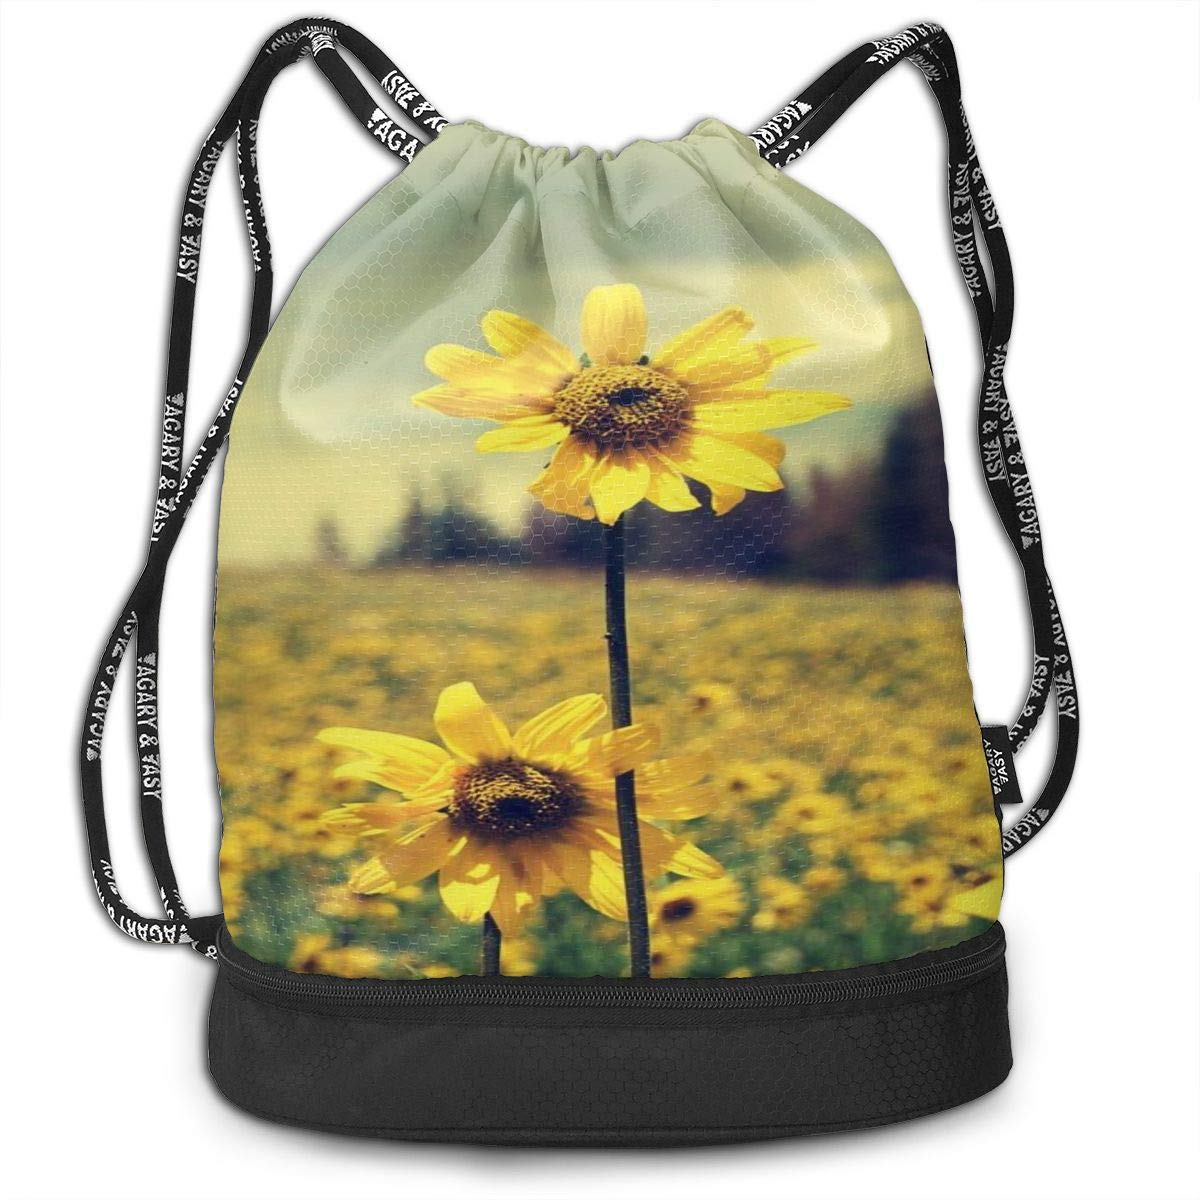 Firm Sunflower Beam Mouth Drawstring Backpack Waterproof Shoulder Strap Leisure Backpack Portable Gym Bag